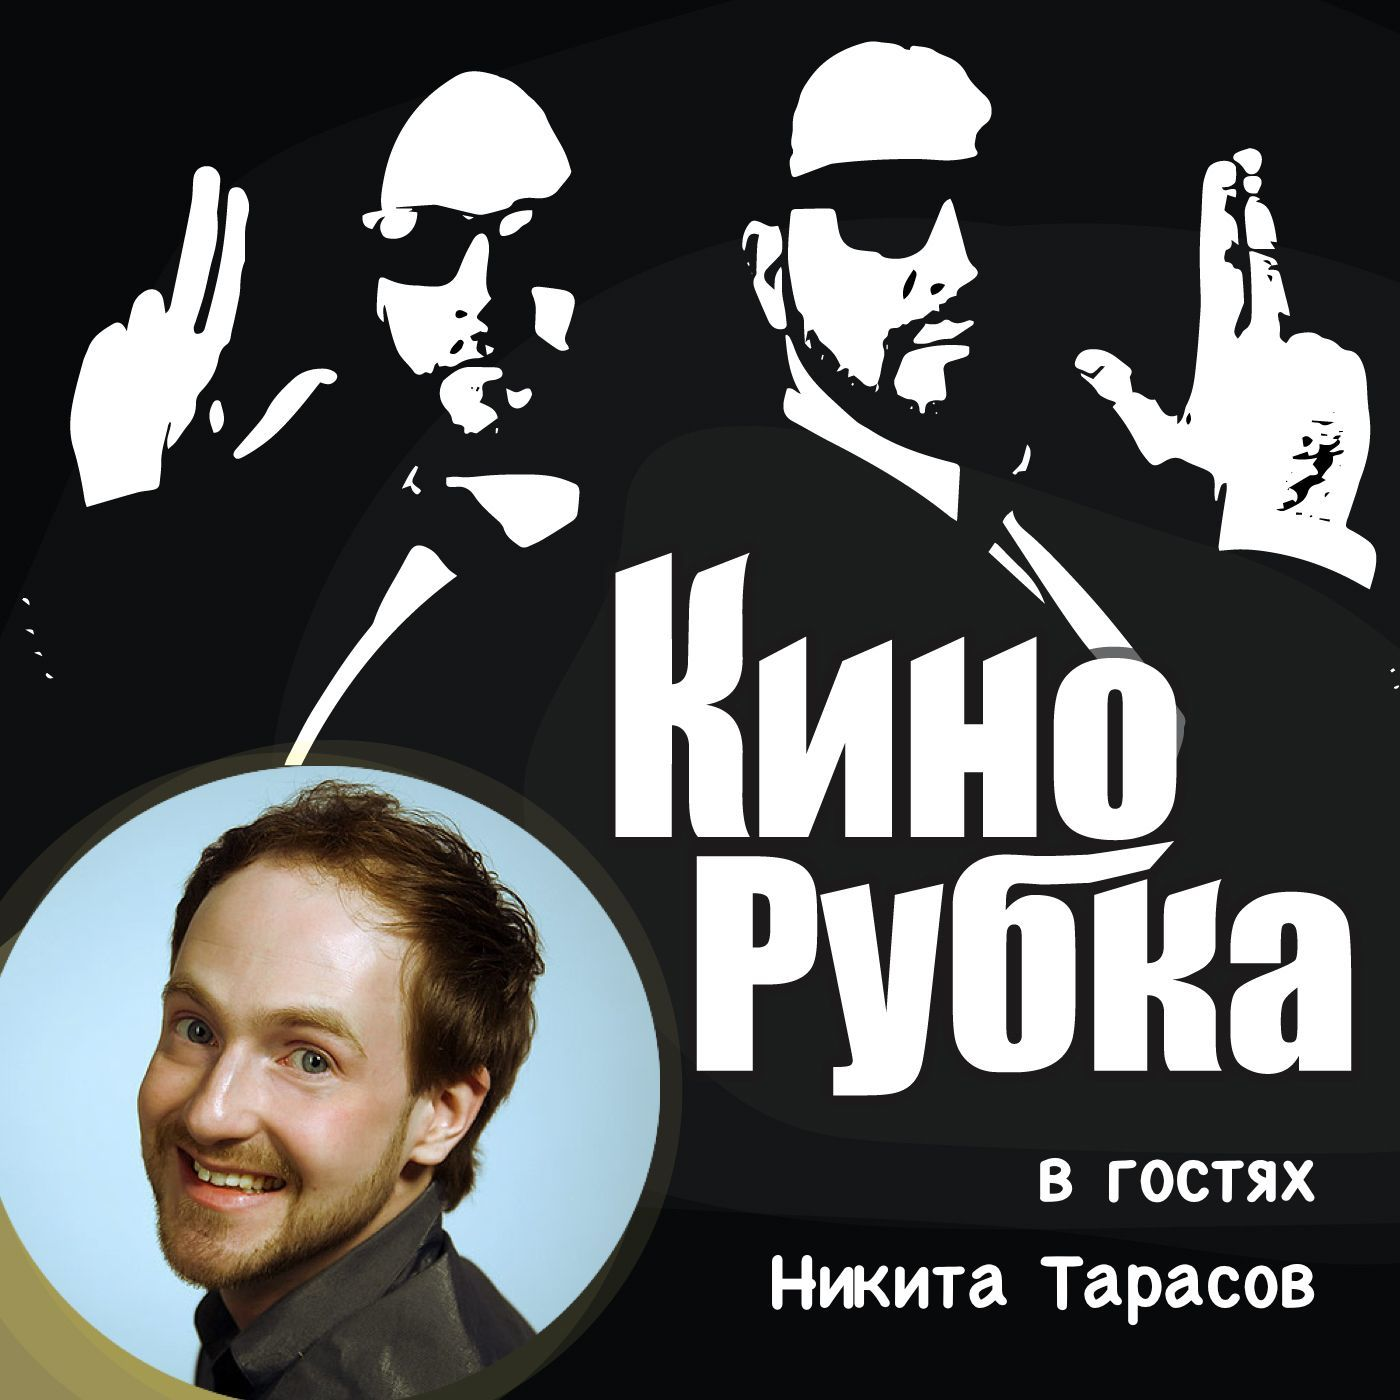 Павел Дикан Актер театра и кино Никита Тарасов павел дикан актер театра и кино николай цонку